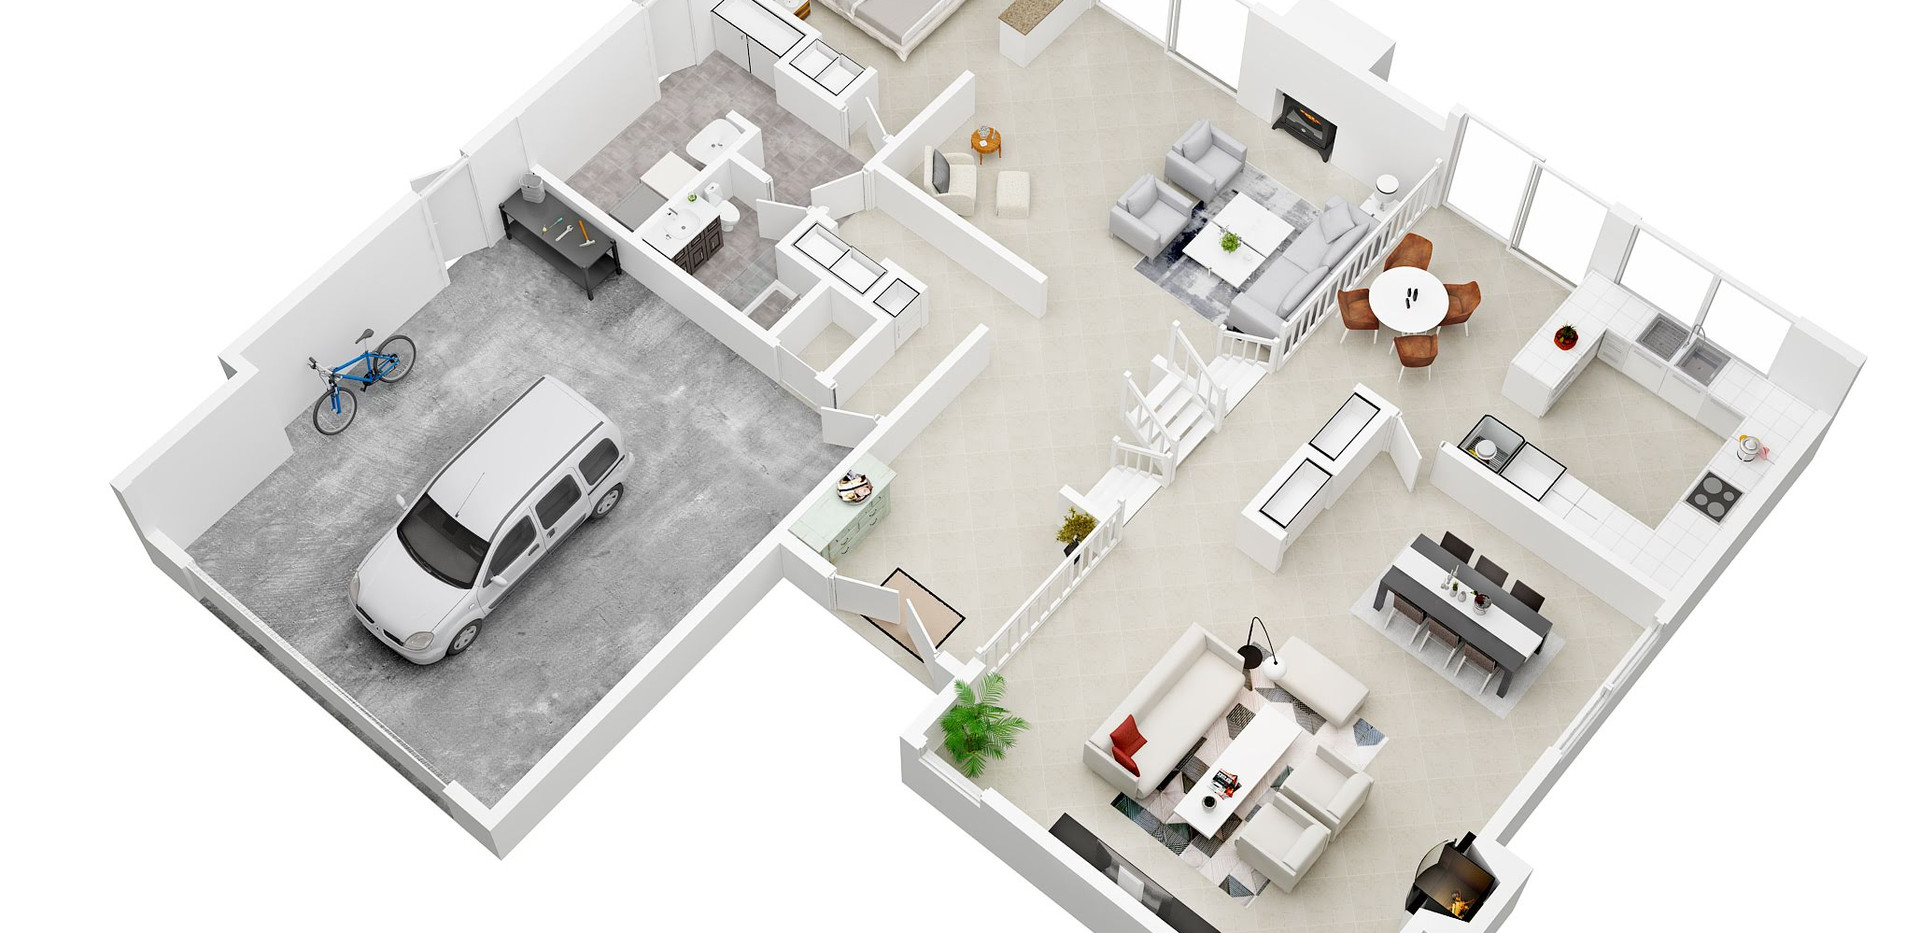 juulease_1_3D  floor plan